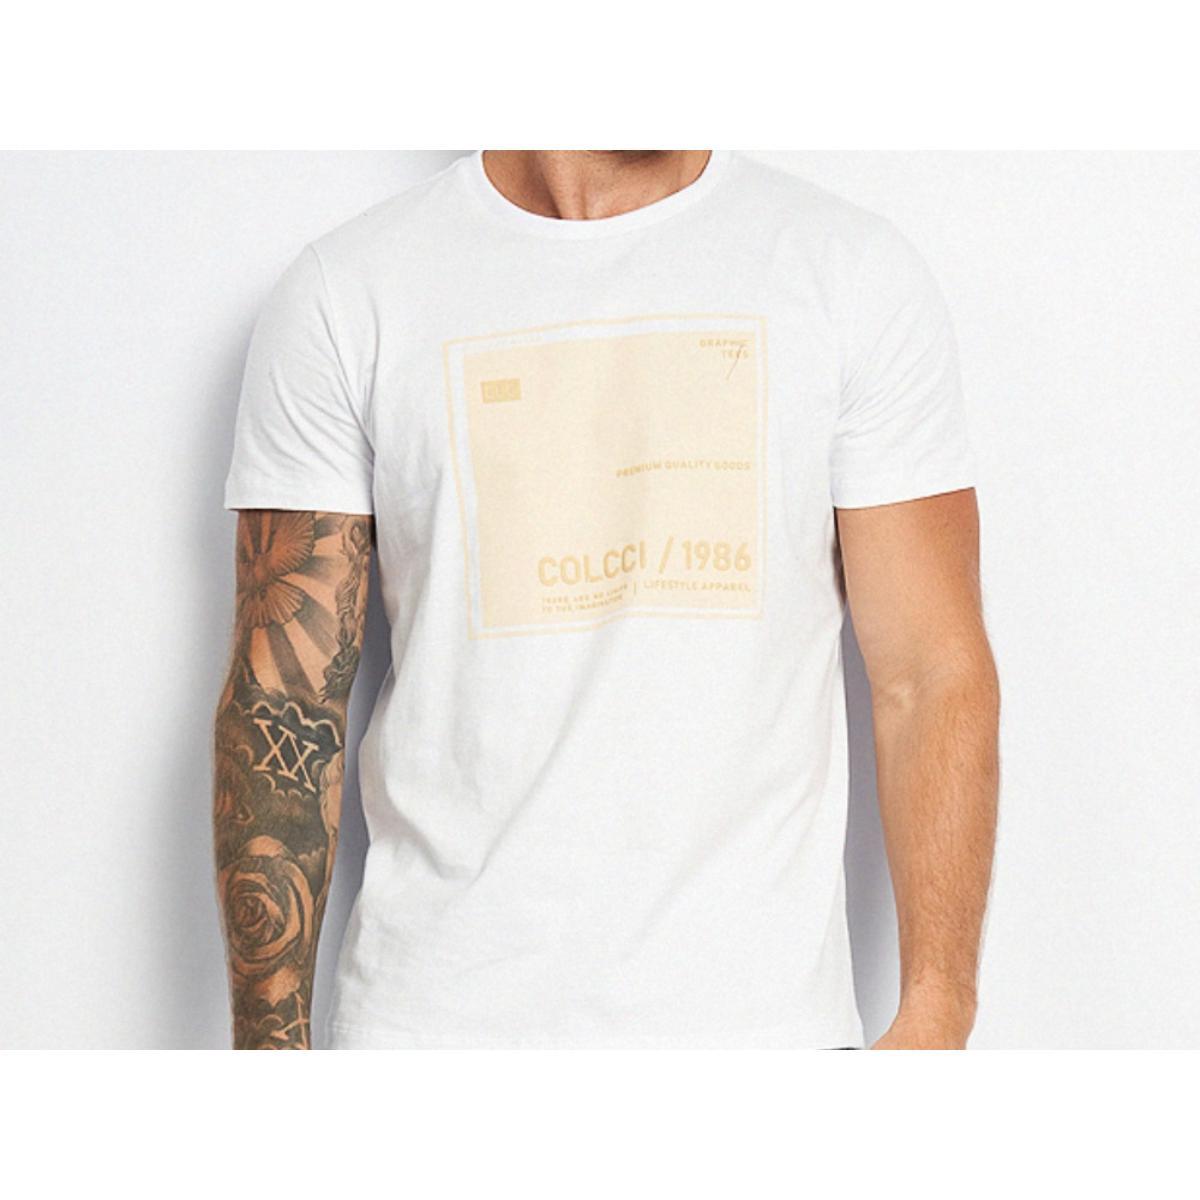 Camiseta Masculina Colcci 350109385 001 Branco